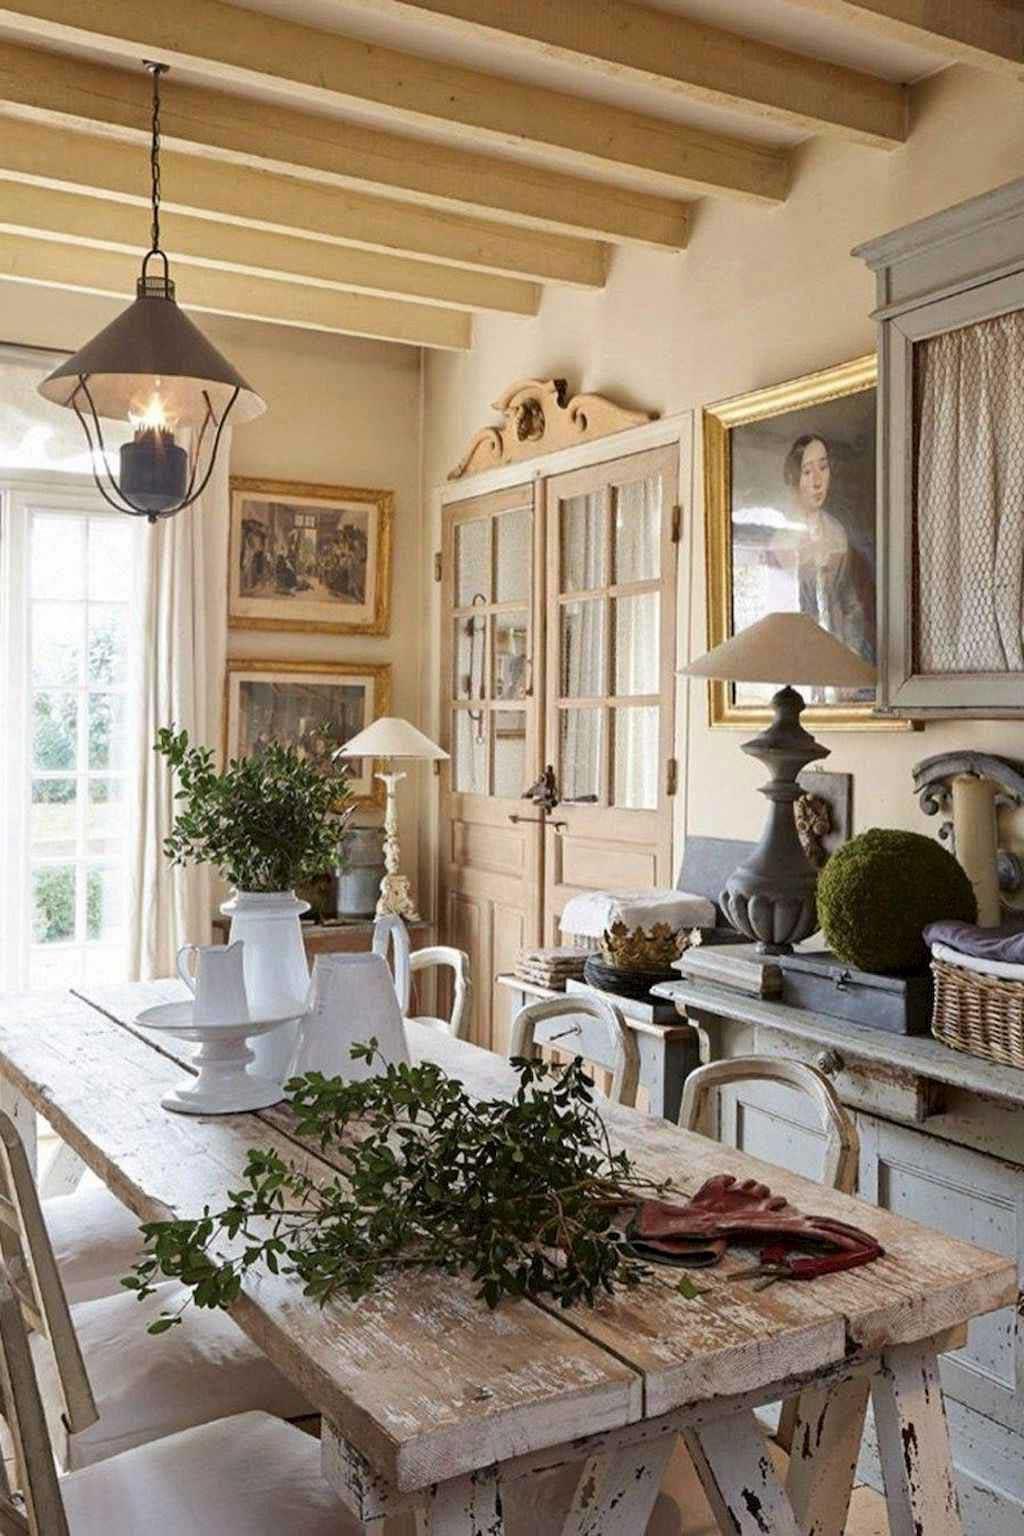 Stunning French Country Kitchen Decor Ideas - Best Home Design Ideas